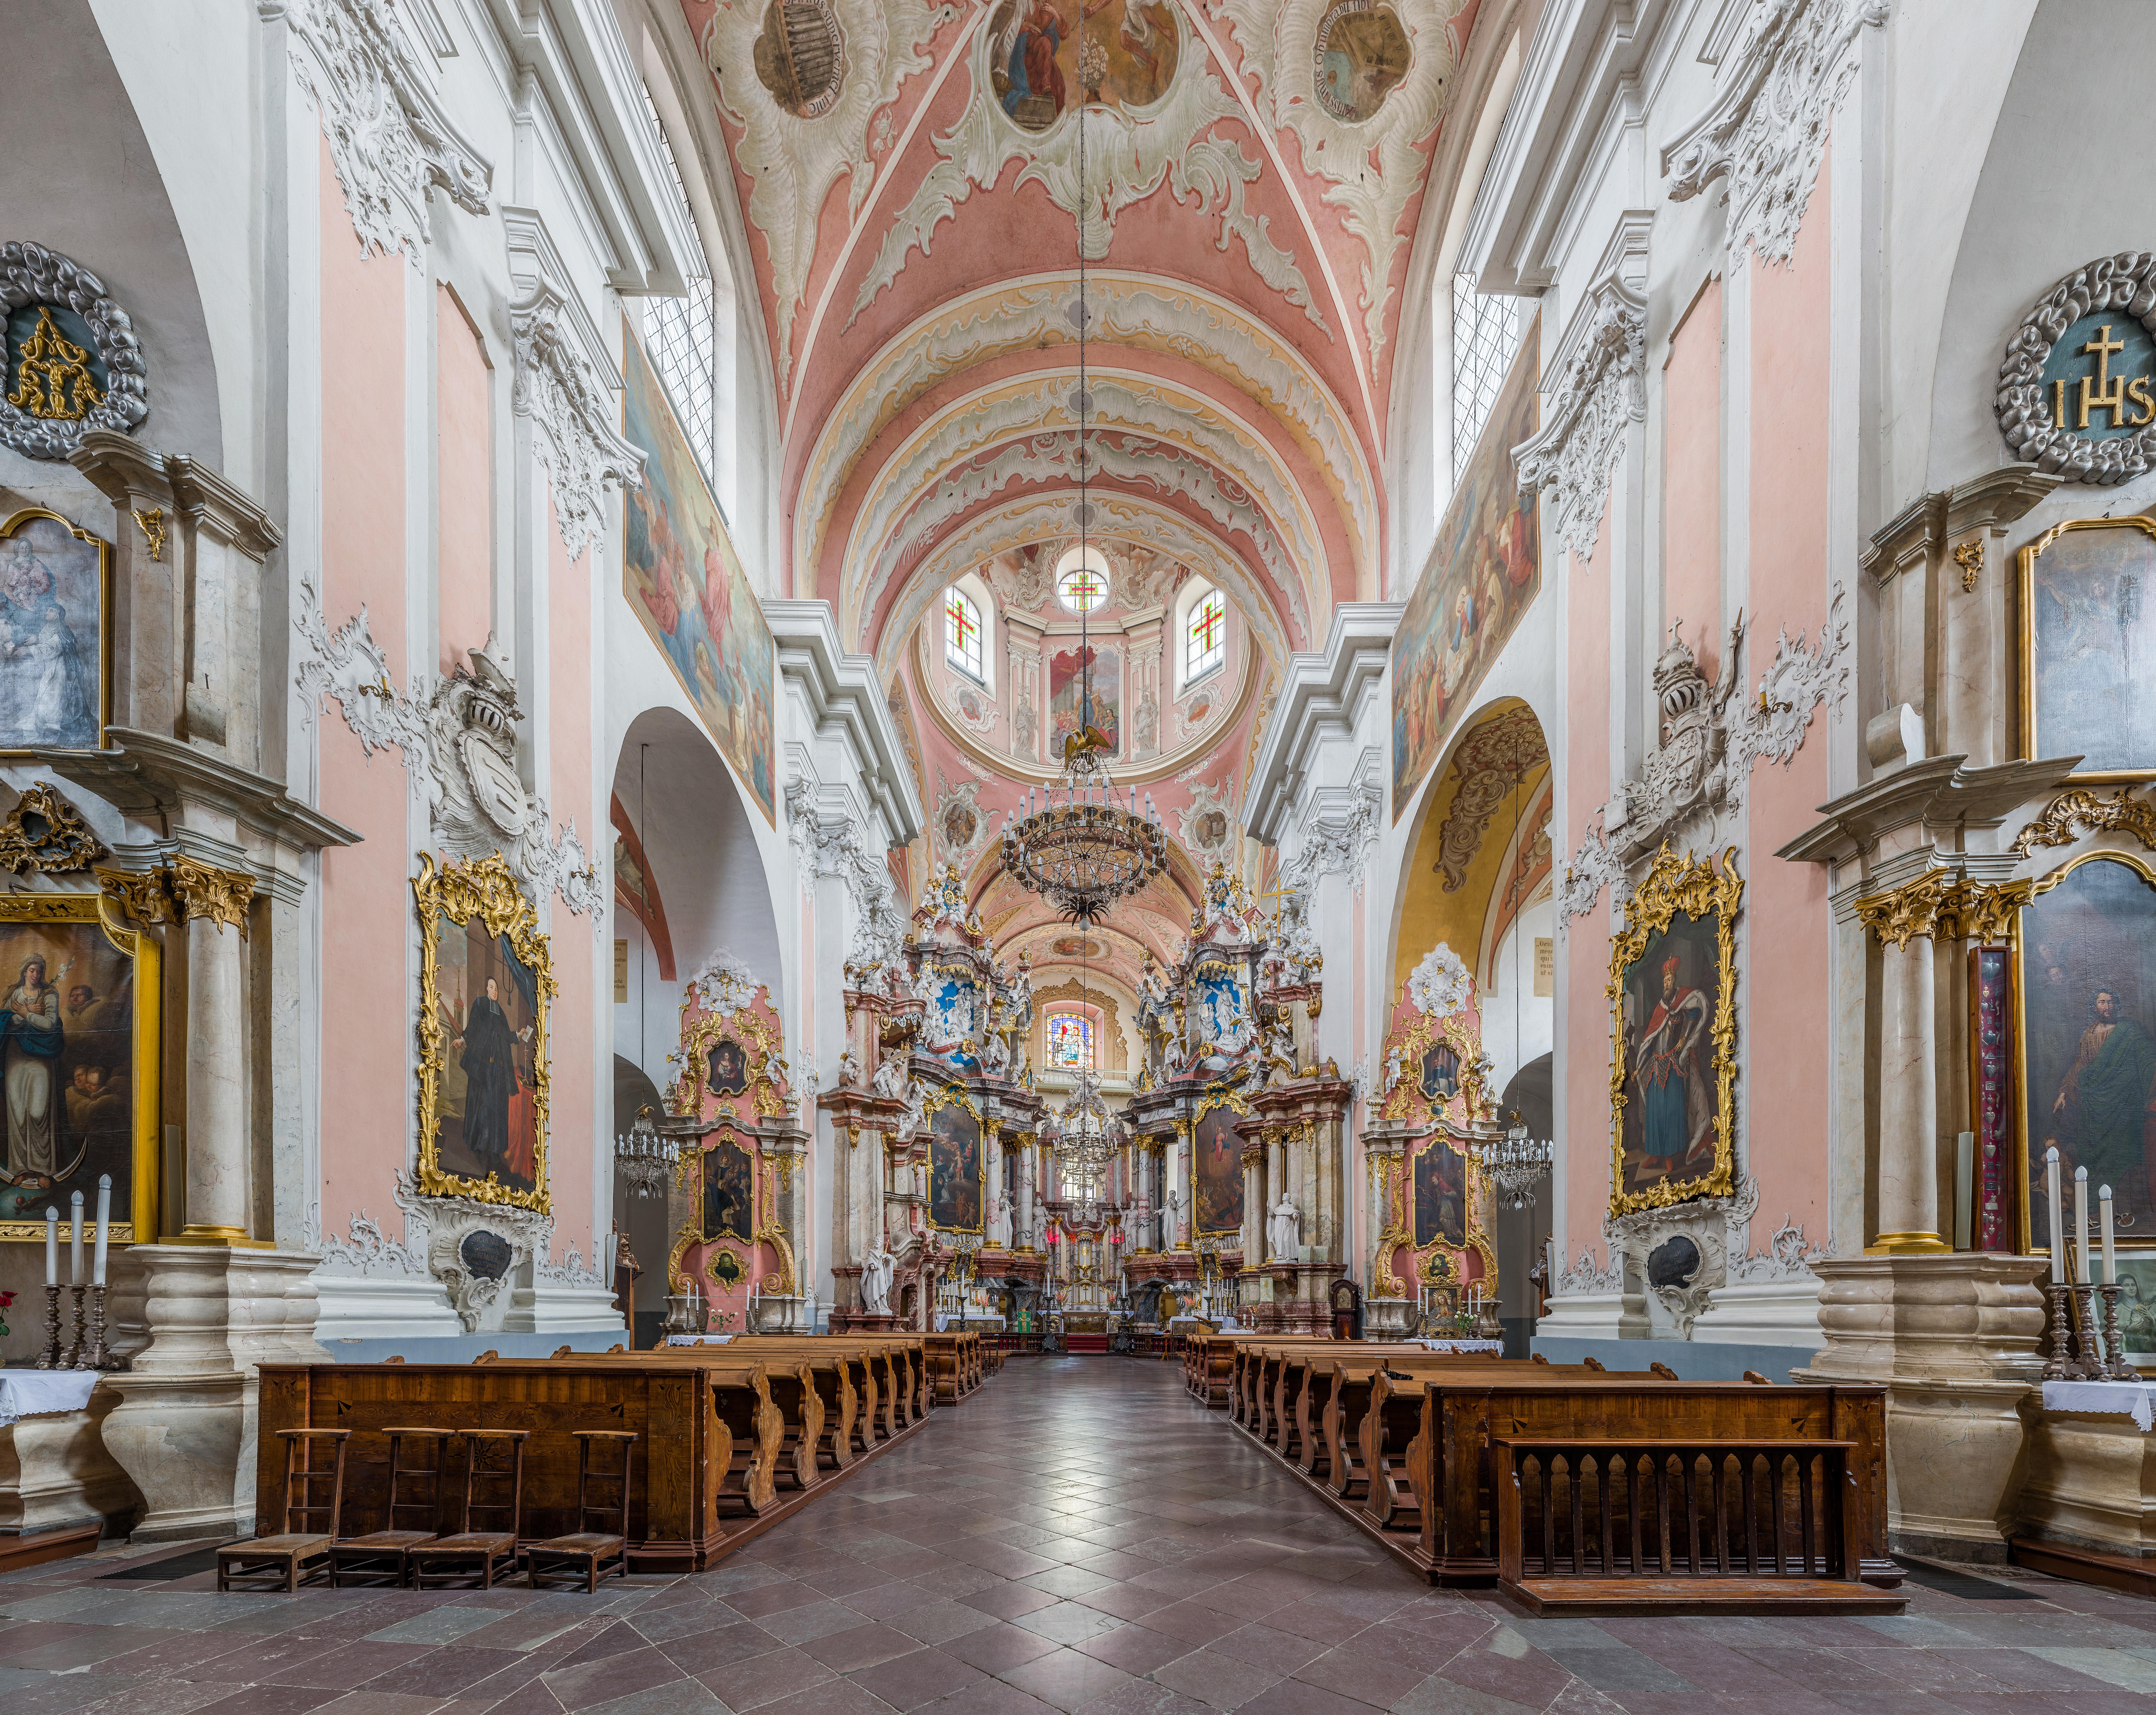 Dominican_Church_of_the_Holy_Spirit%2C_Vilnius%2C_Lithuania_-_Diliff.jpg